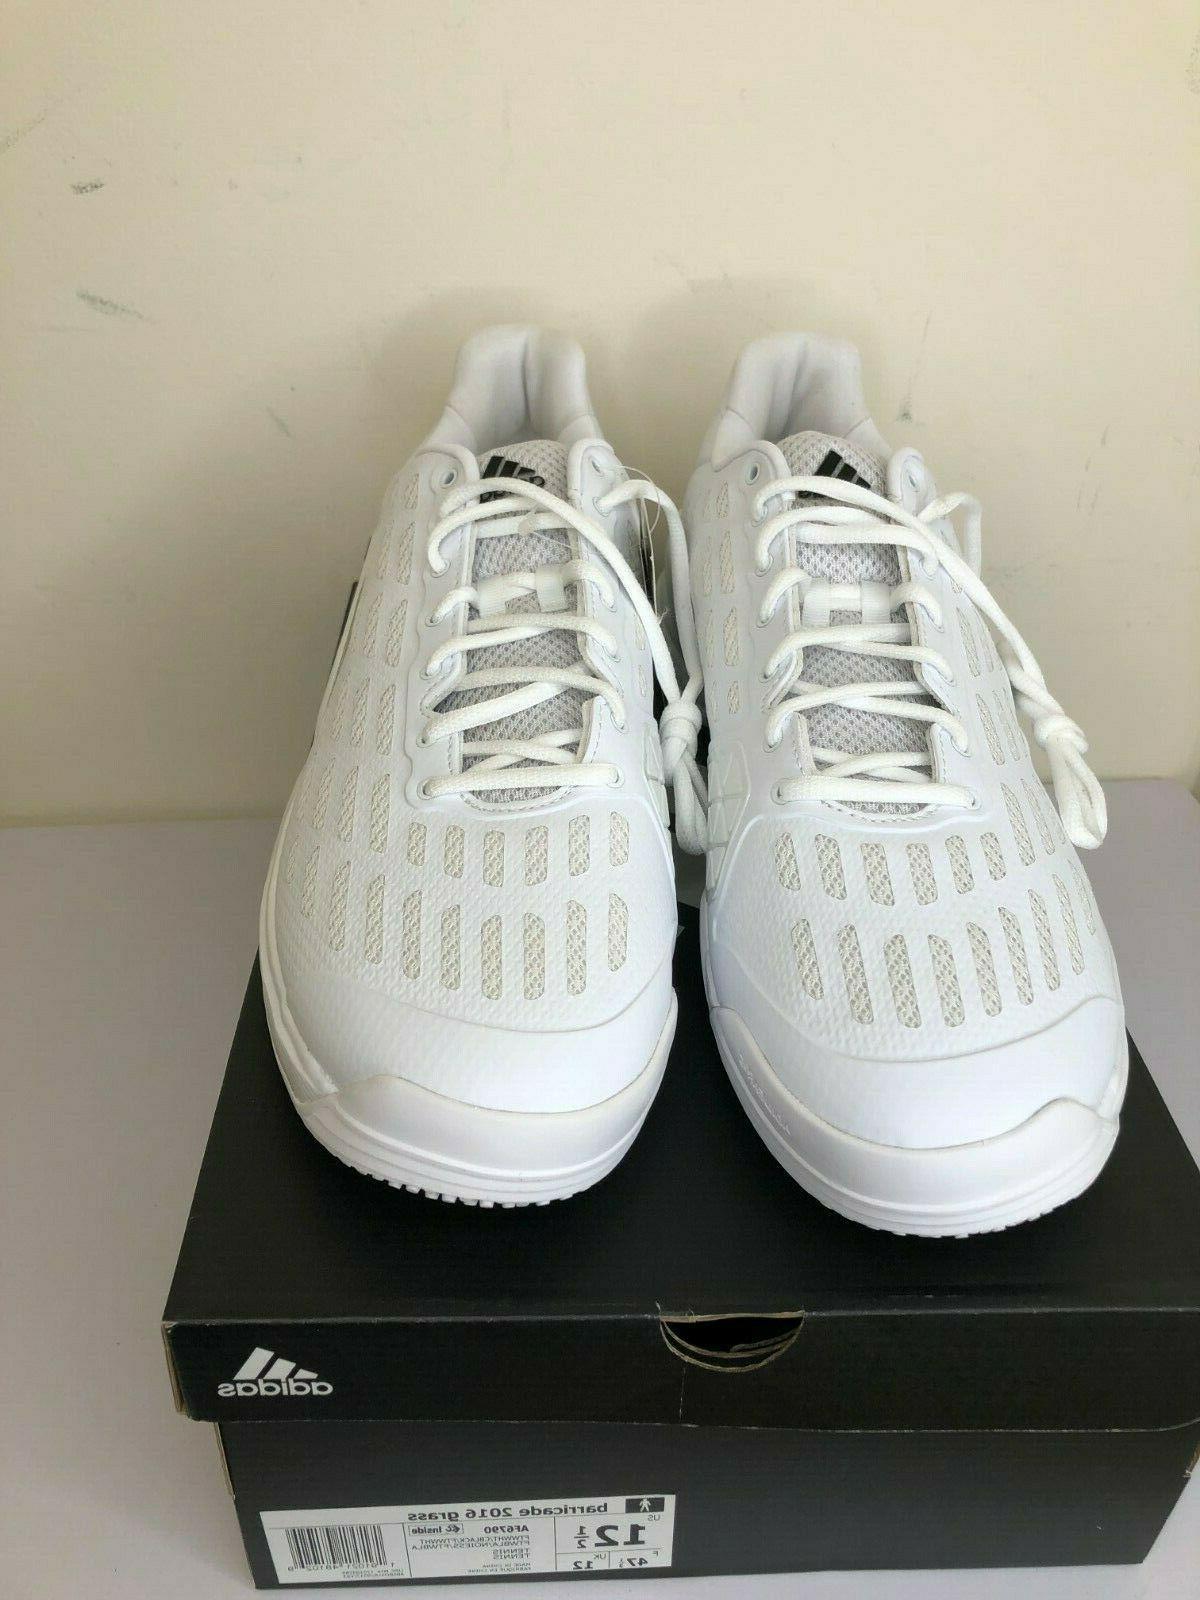 Mens Grass Tennis Shoes Size 12.5 White Black